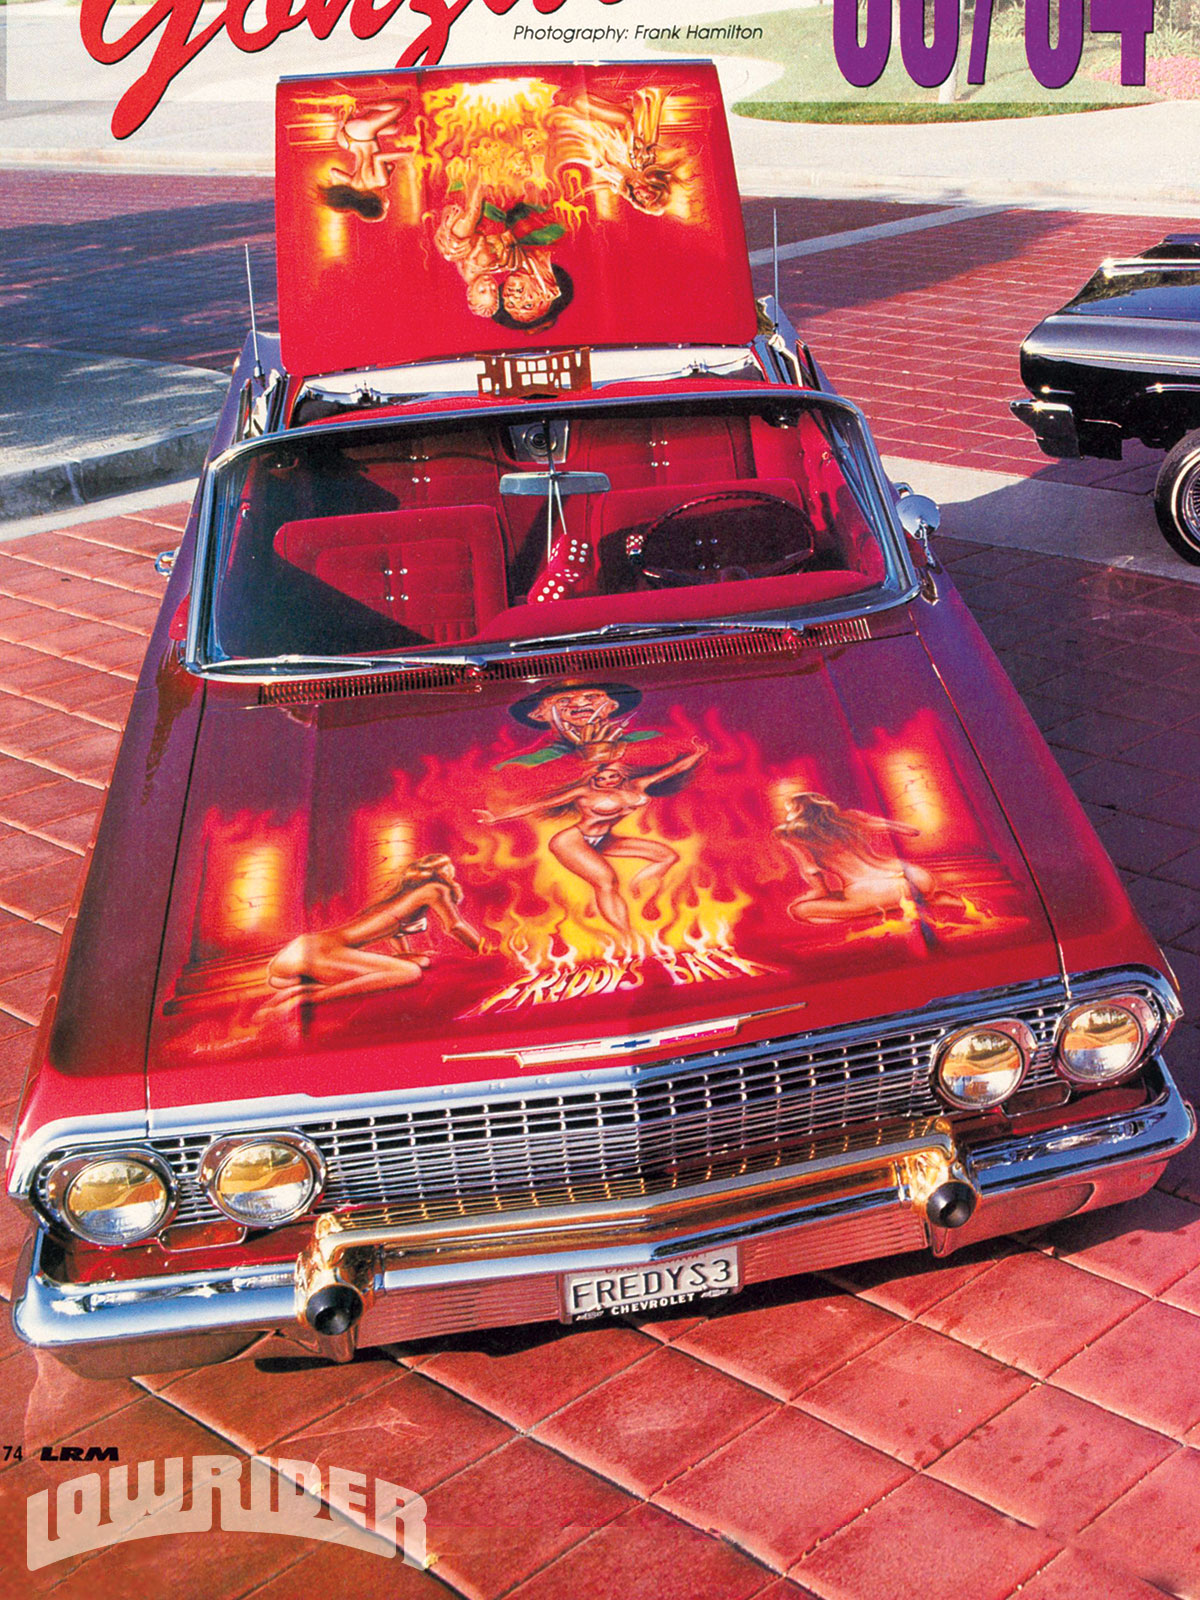 Classic Lowrider Images - Lowrider Magazine